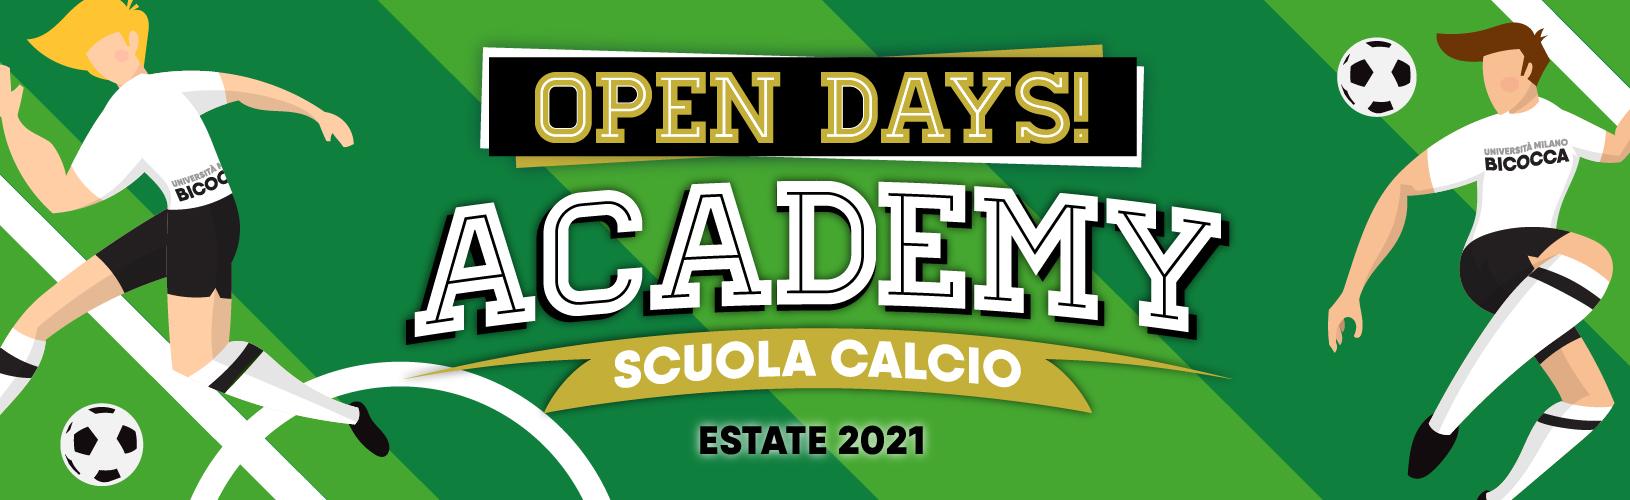 Open Days • CUS Bicocca Academy • Scuola Calcio